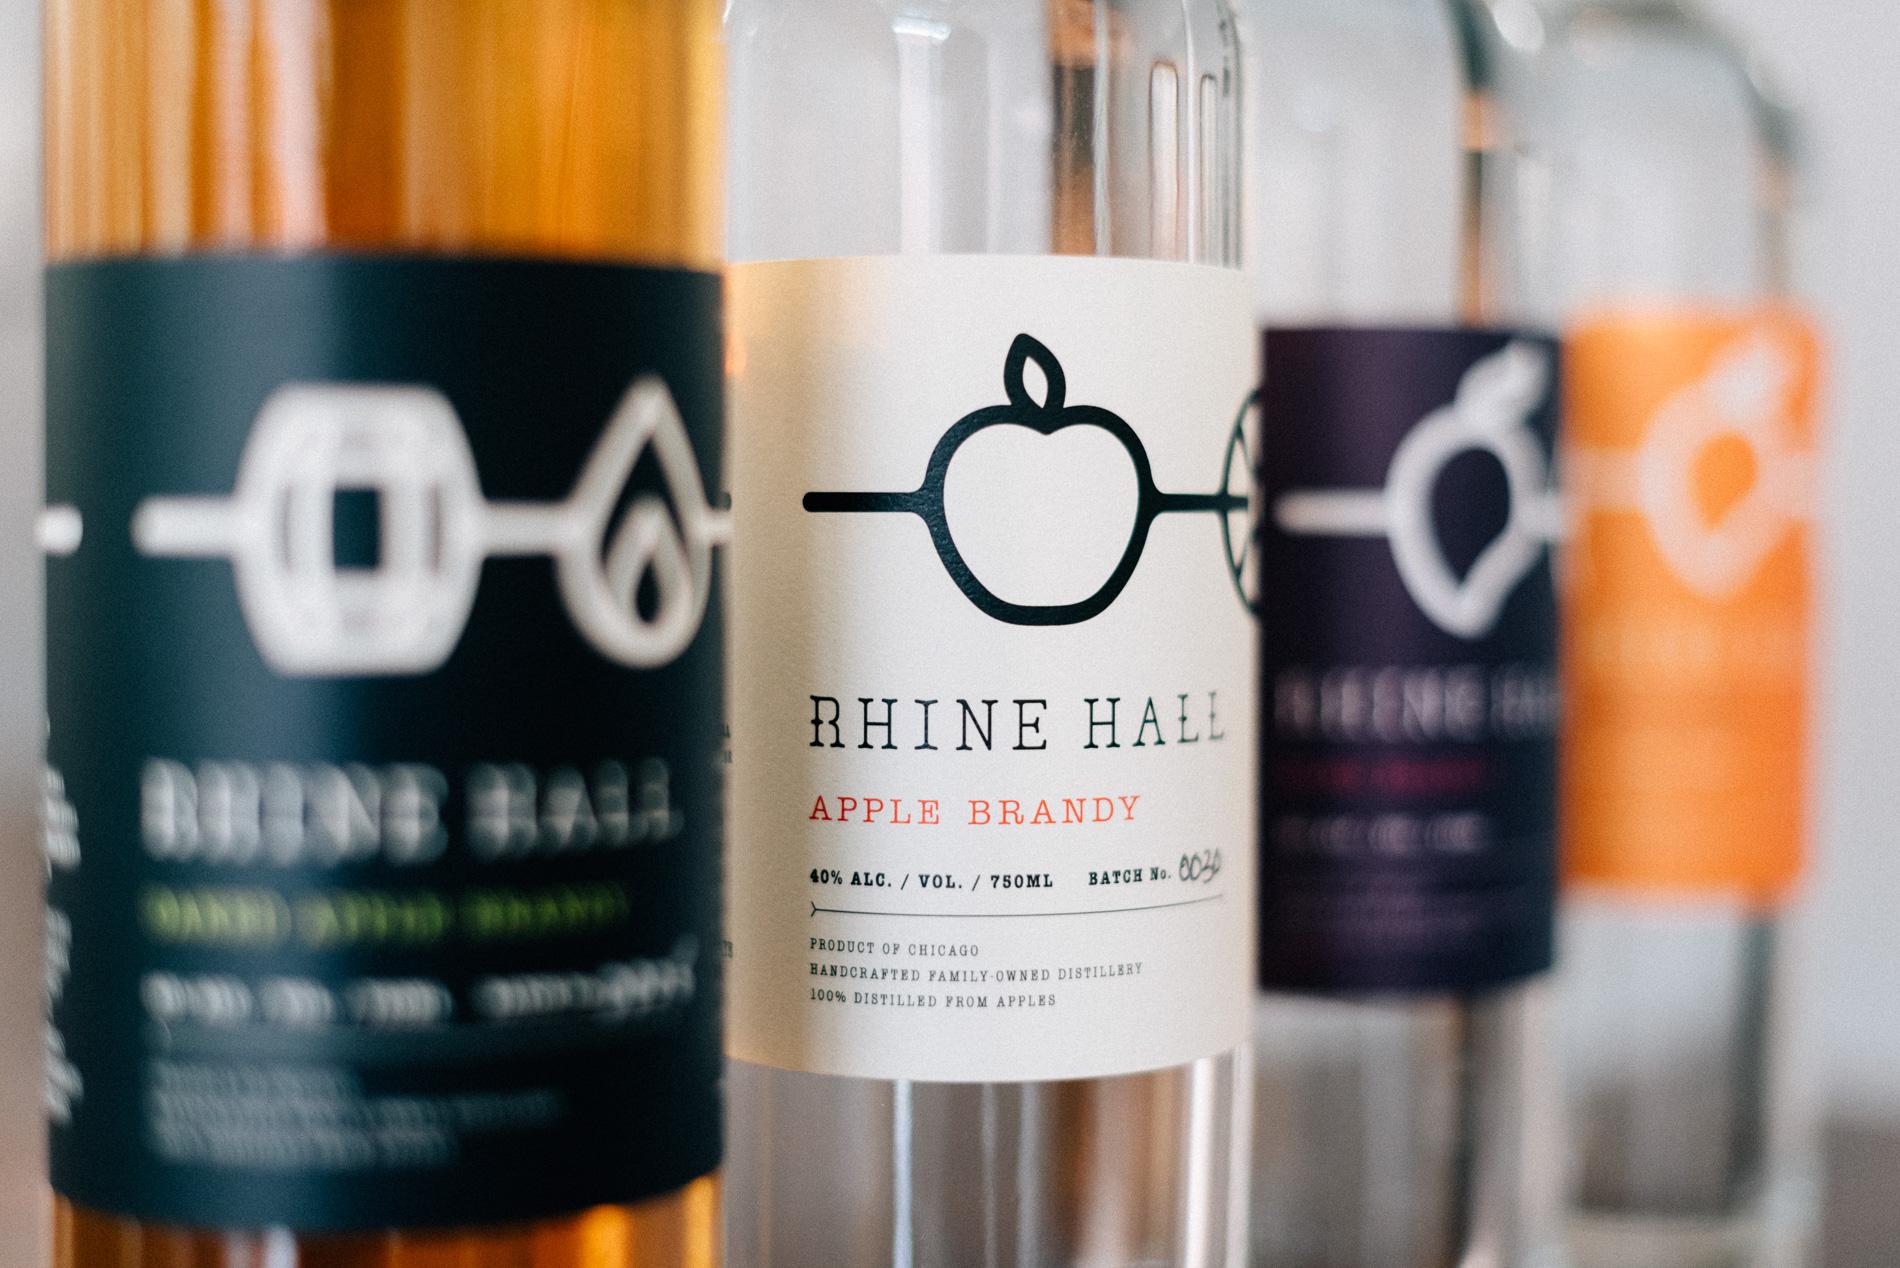 rhine-hall-distillery-164432.jpg